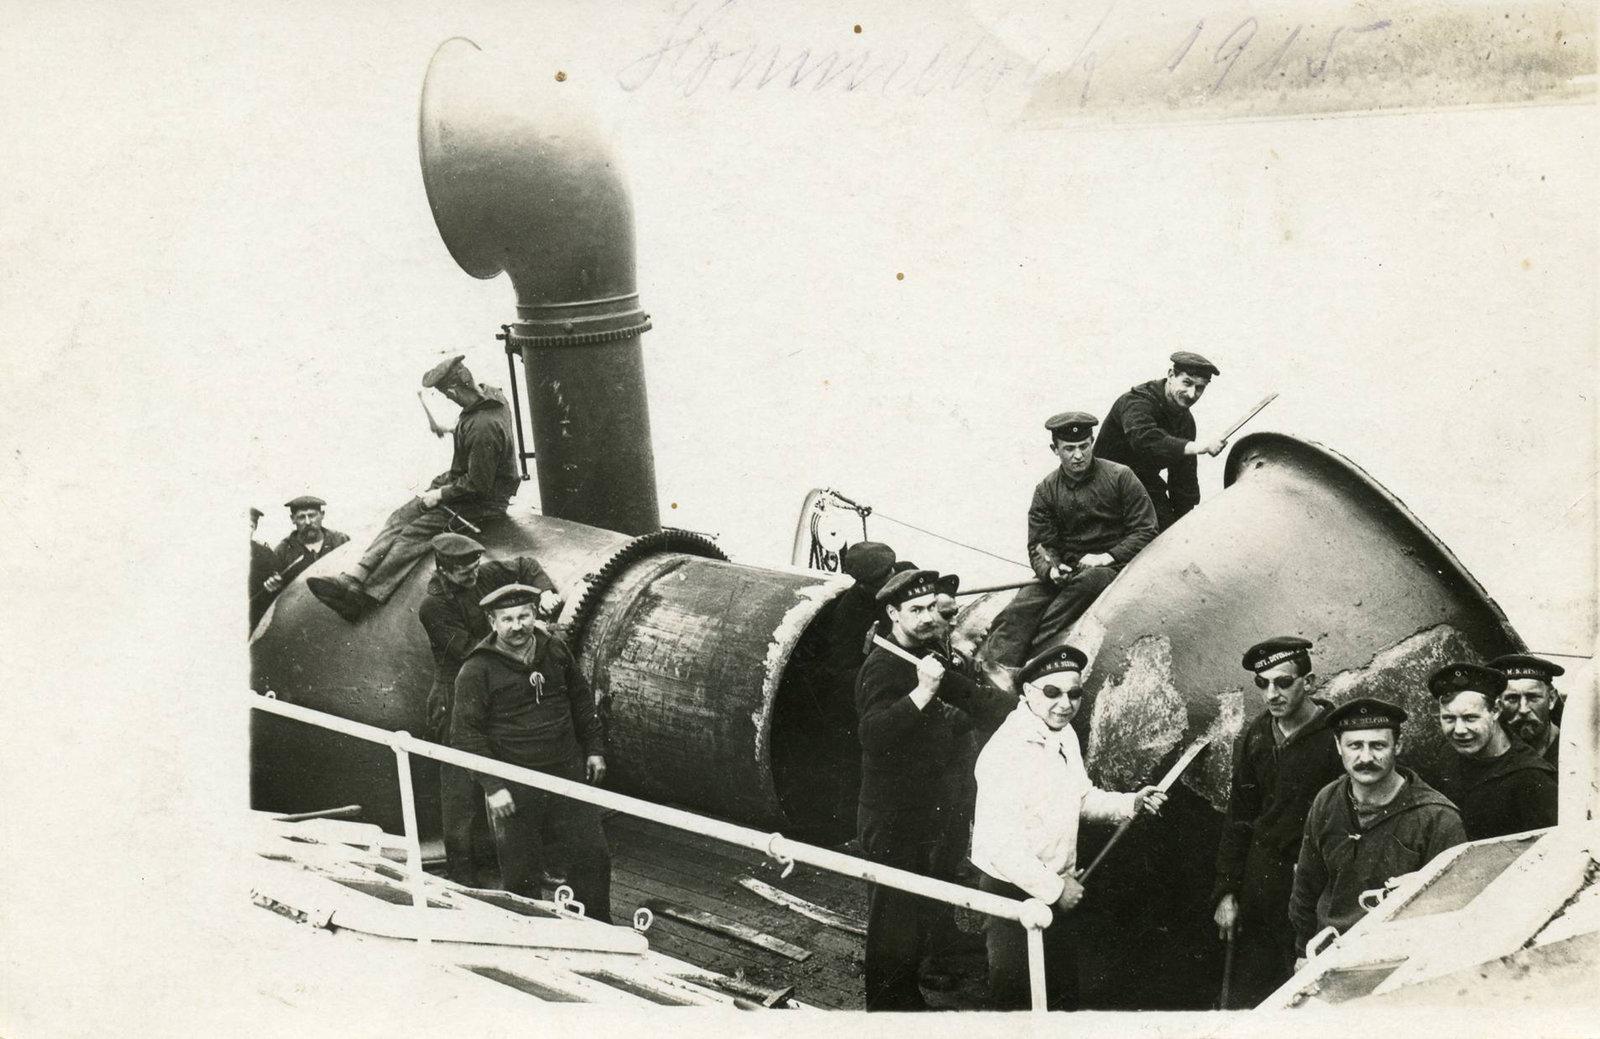 Postcard crew of SM Berlin,  Rudolf Kämmerer, July 20, 1915, Europeana 1914-1918 / Bernd Rossberg, CC BY-SA